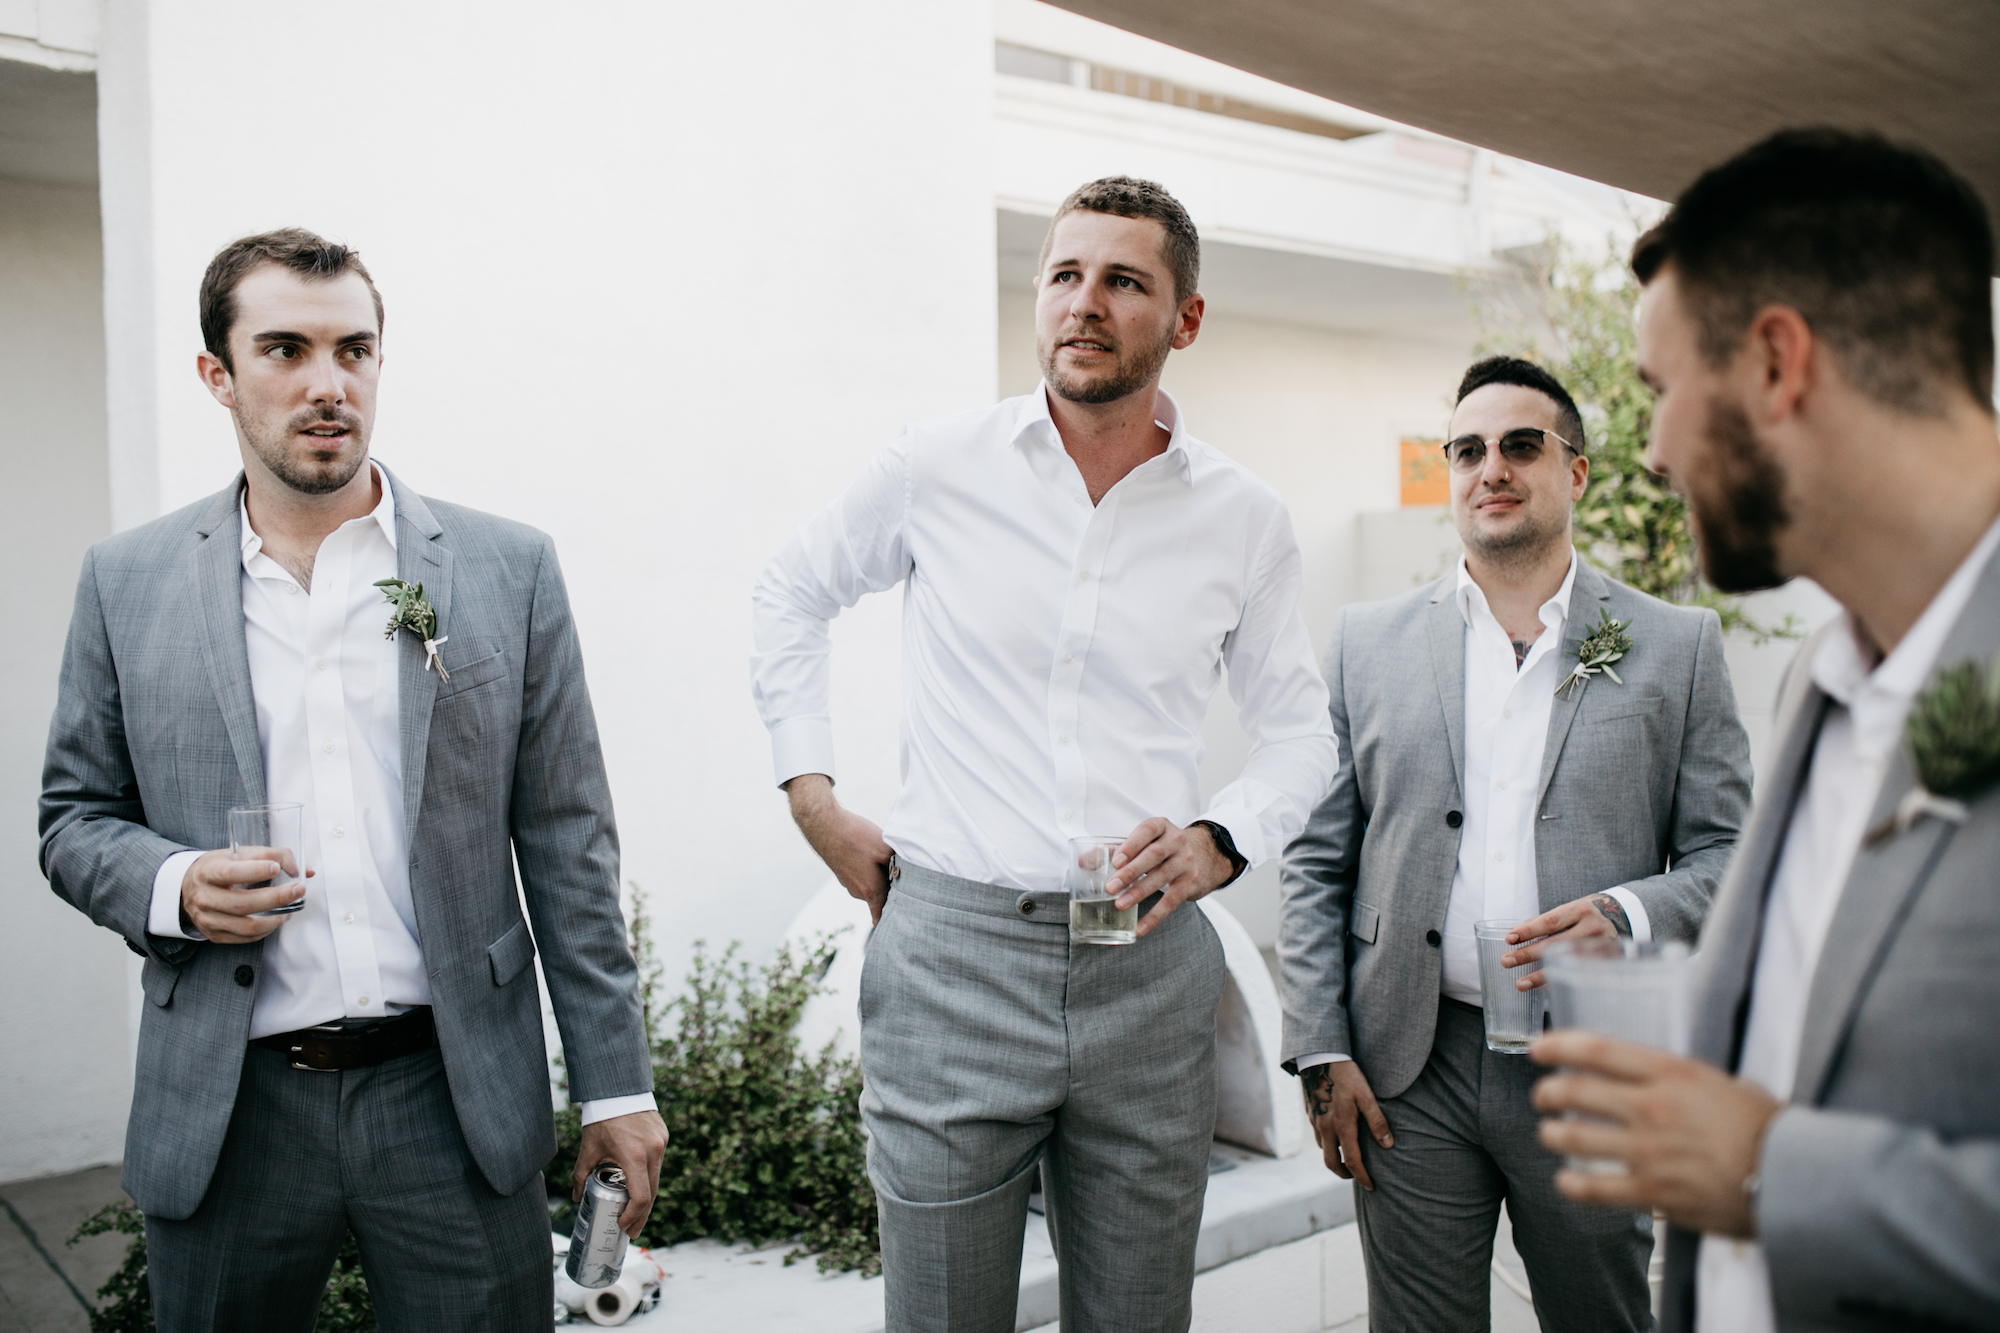 ace-hotel-palm-springs-wedding-photographer461.jpg